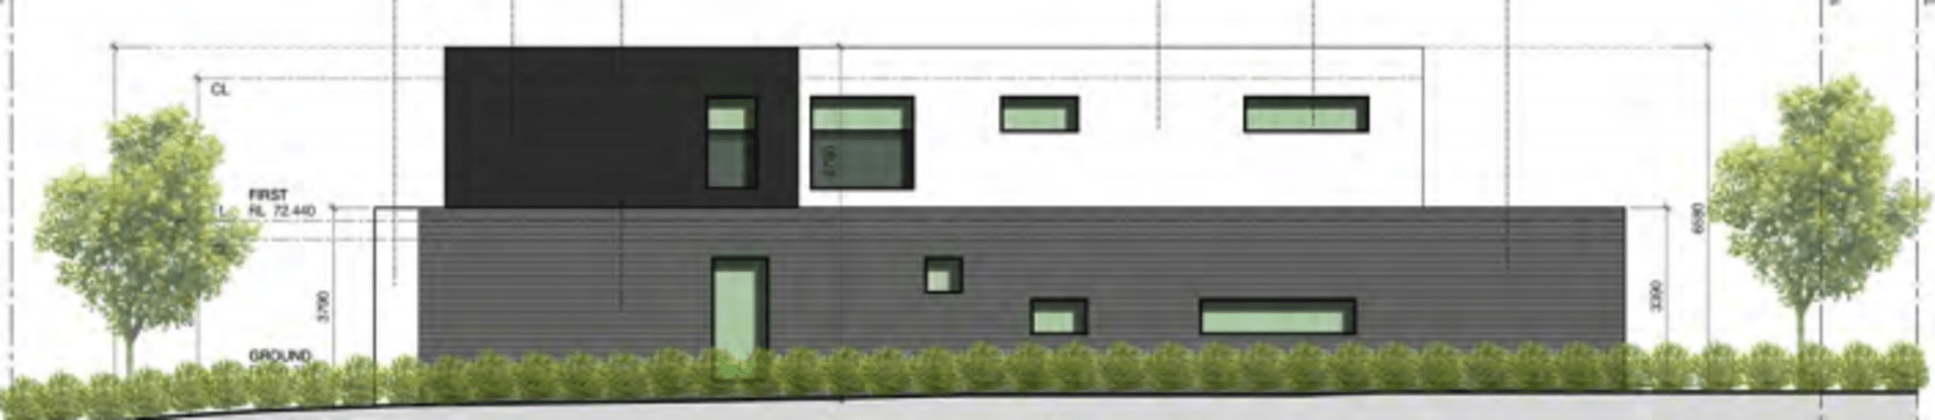 Project image: Studio Abode